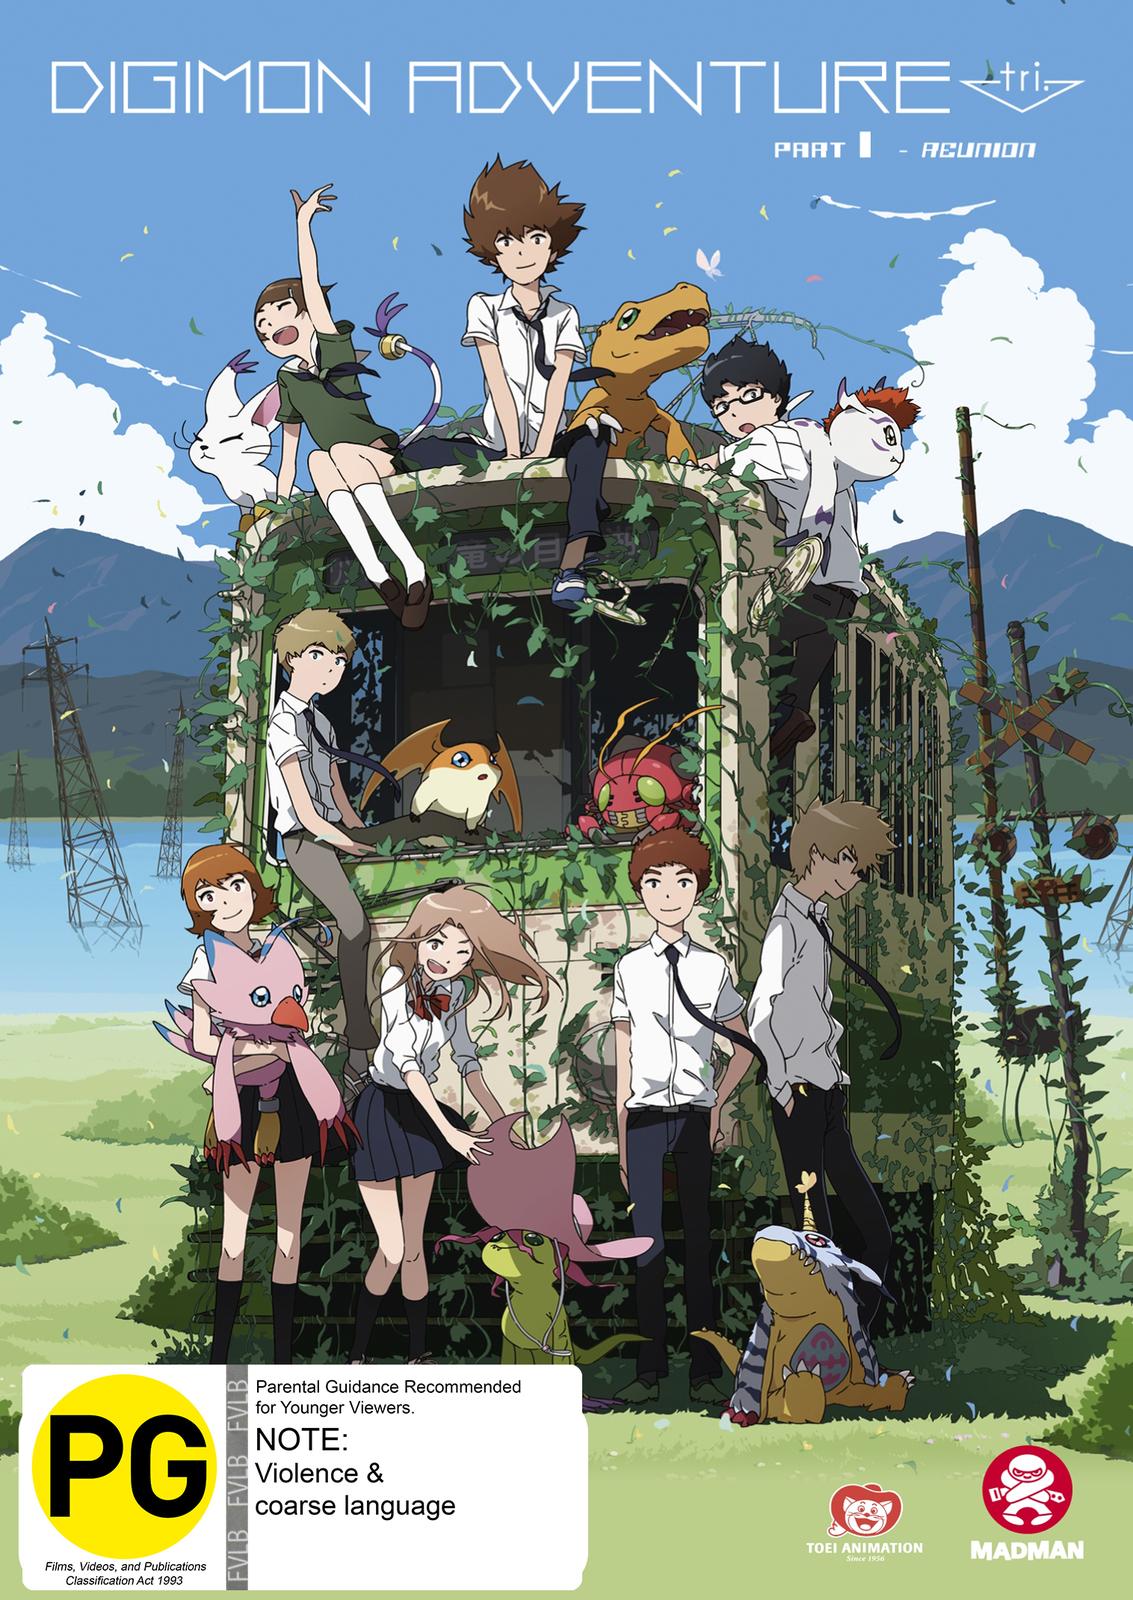 Digimon Adventure Tri. Part 1 - Reunion on DVD image